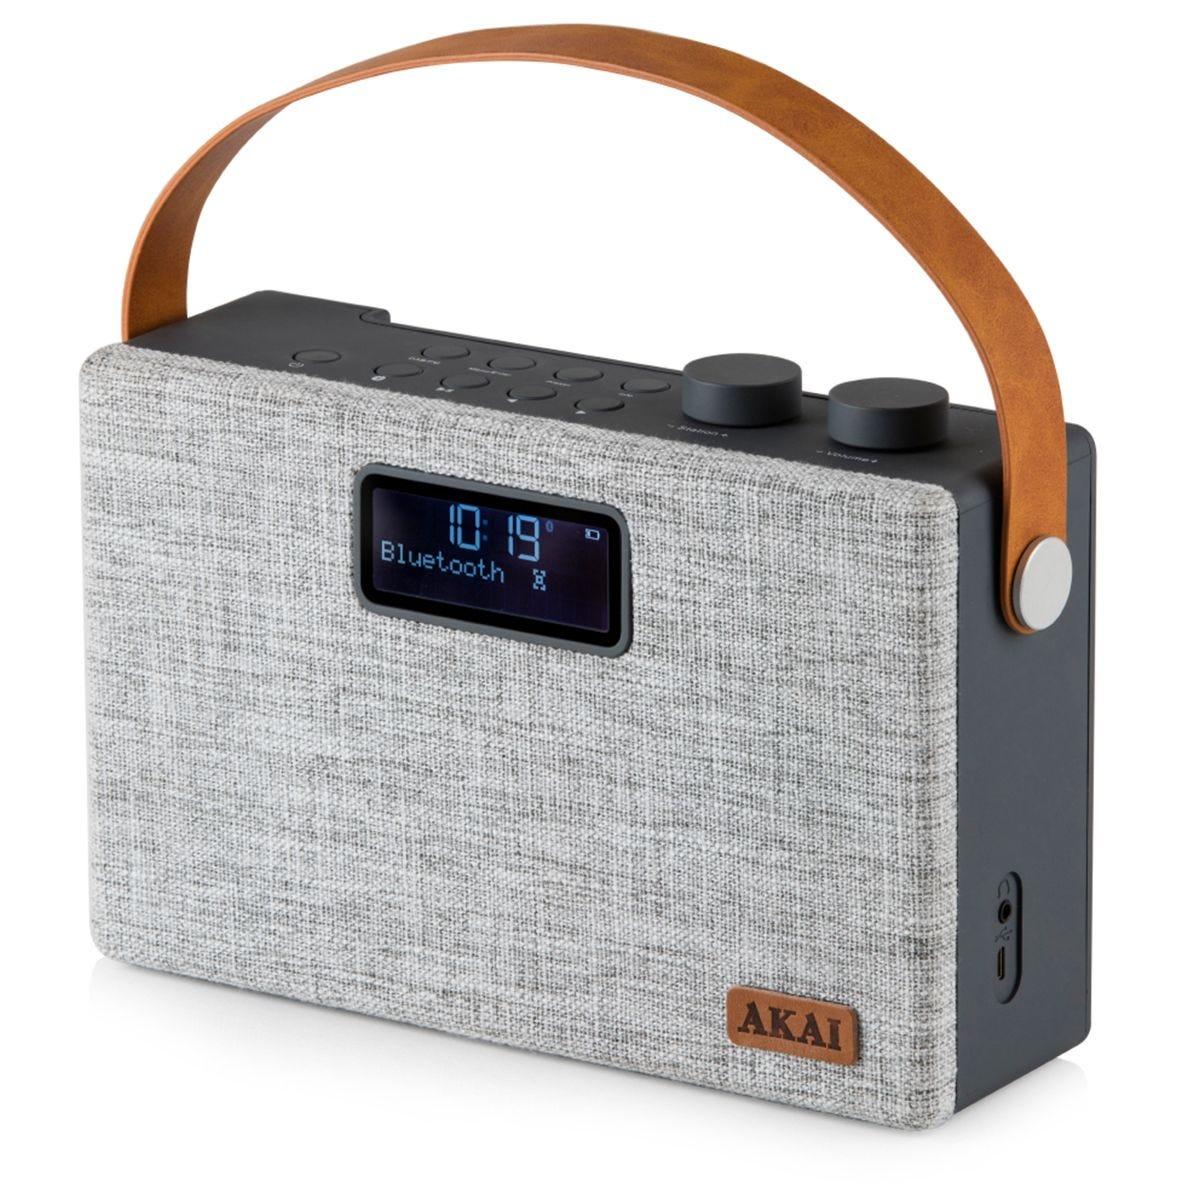 AKAI Bluetooth DAB + Radio - Grey